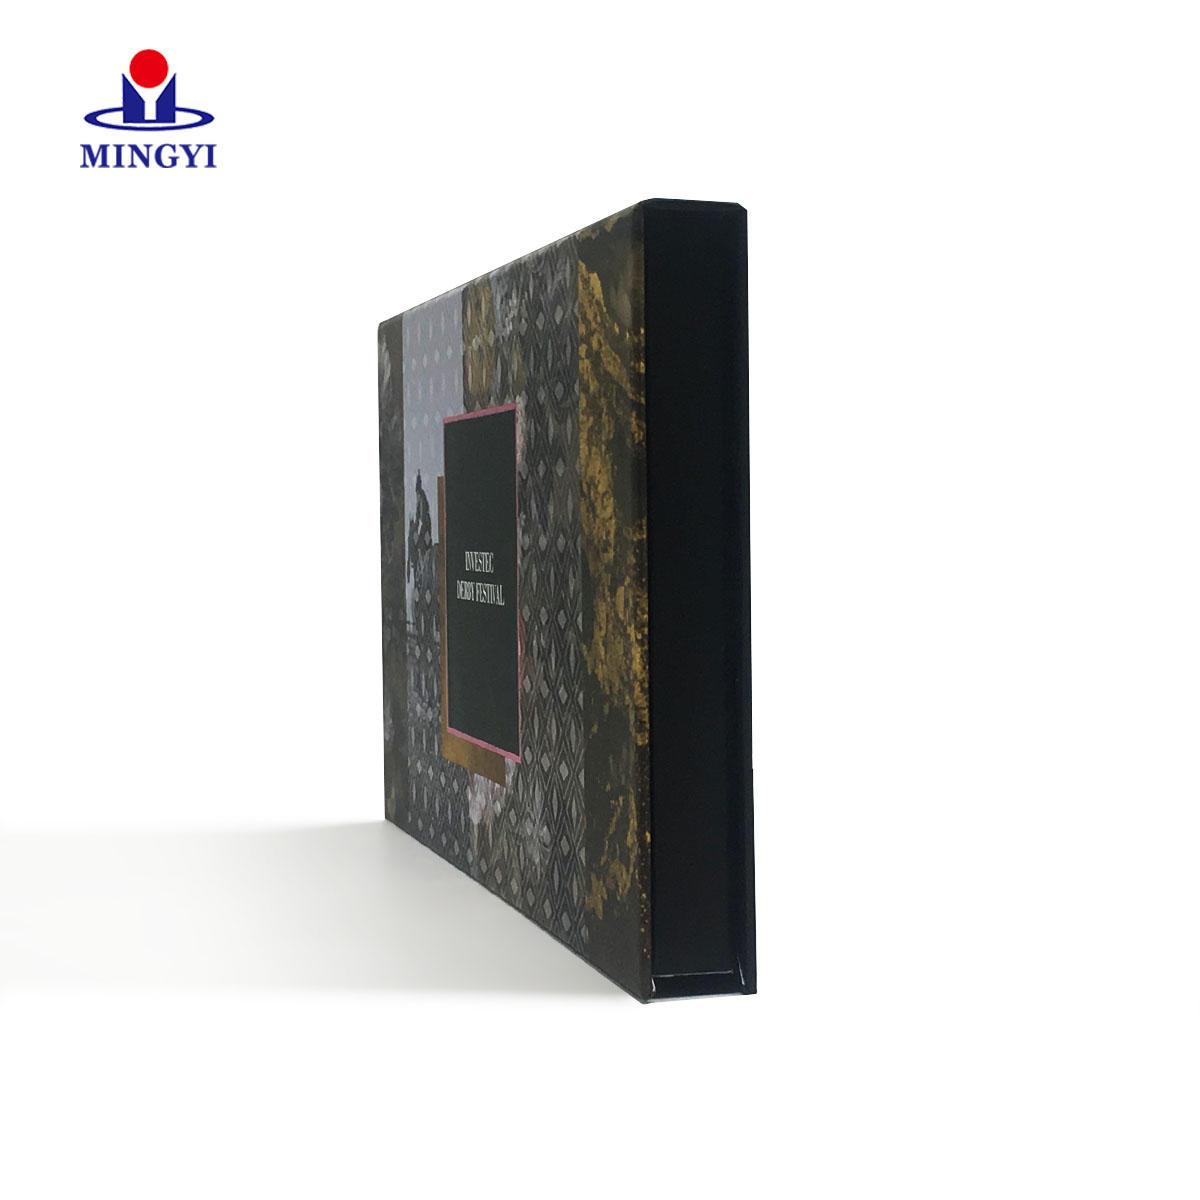 Customized luxury invitation box book-shape structure